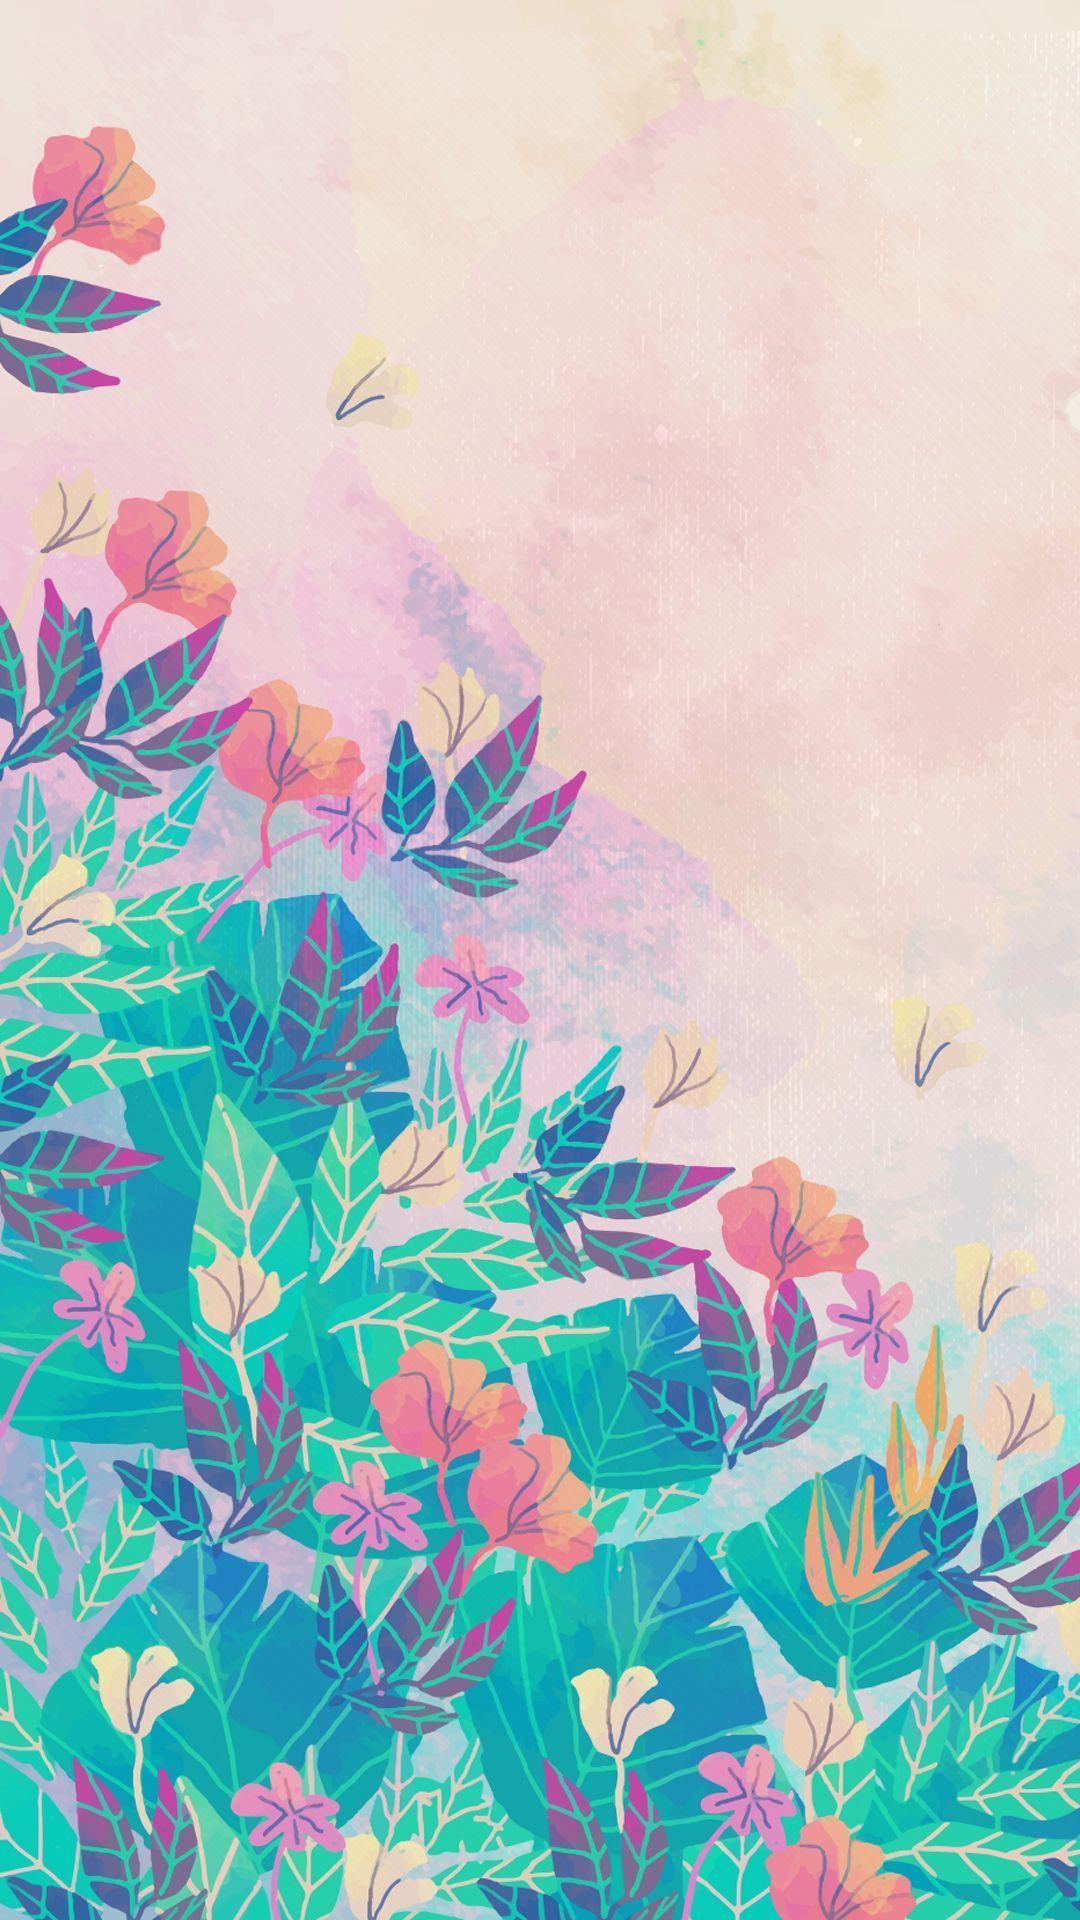 Watercolor Android Iphone Desktop Hd Backgrounds Wallpapers 1080p 4k 107509 Hdwallpap Watercolor Wallpaper Pink Wallpaper Iphone Watercolor Iphone